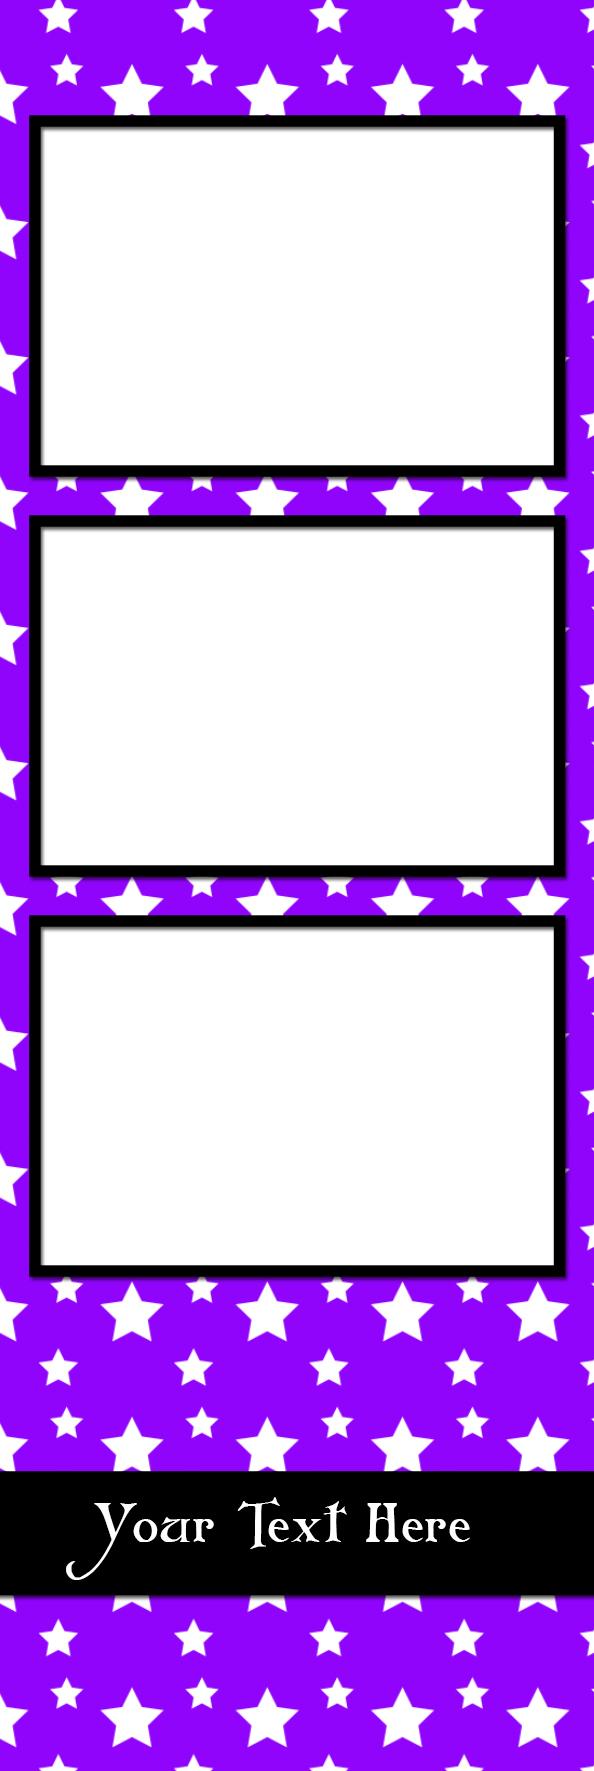 Texture_Stars-V-6P9.jpg